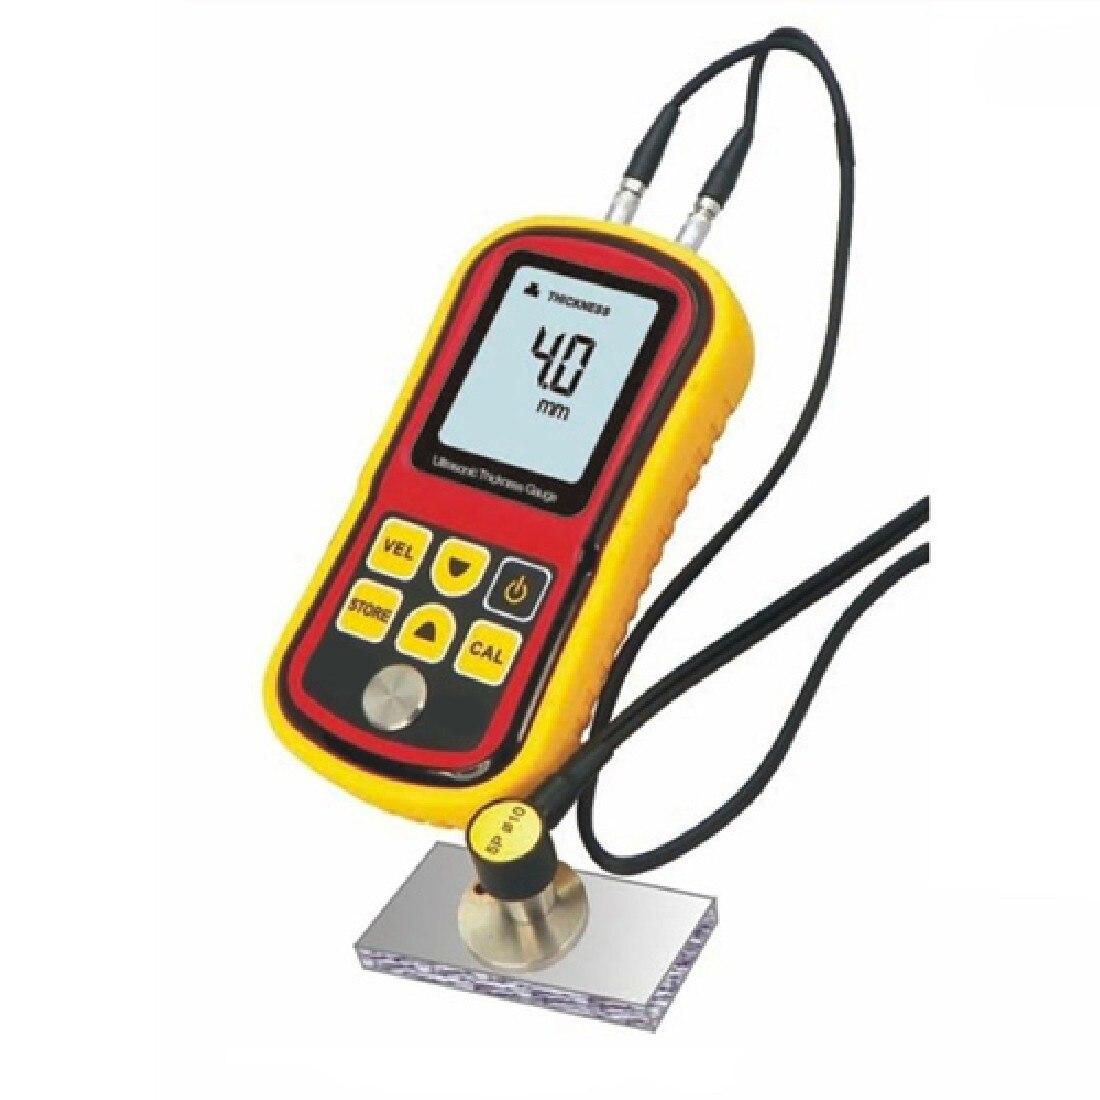 1.2~225mm (Steel) GM100 Ultrasonic Thickness Gauge Tester LCD backlight display Metal detector Range finder Tester прибор измерения ширины oem gm100 lcd 1 2 225